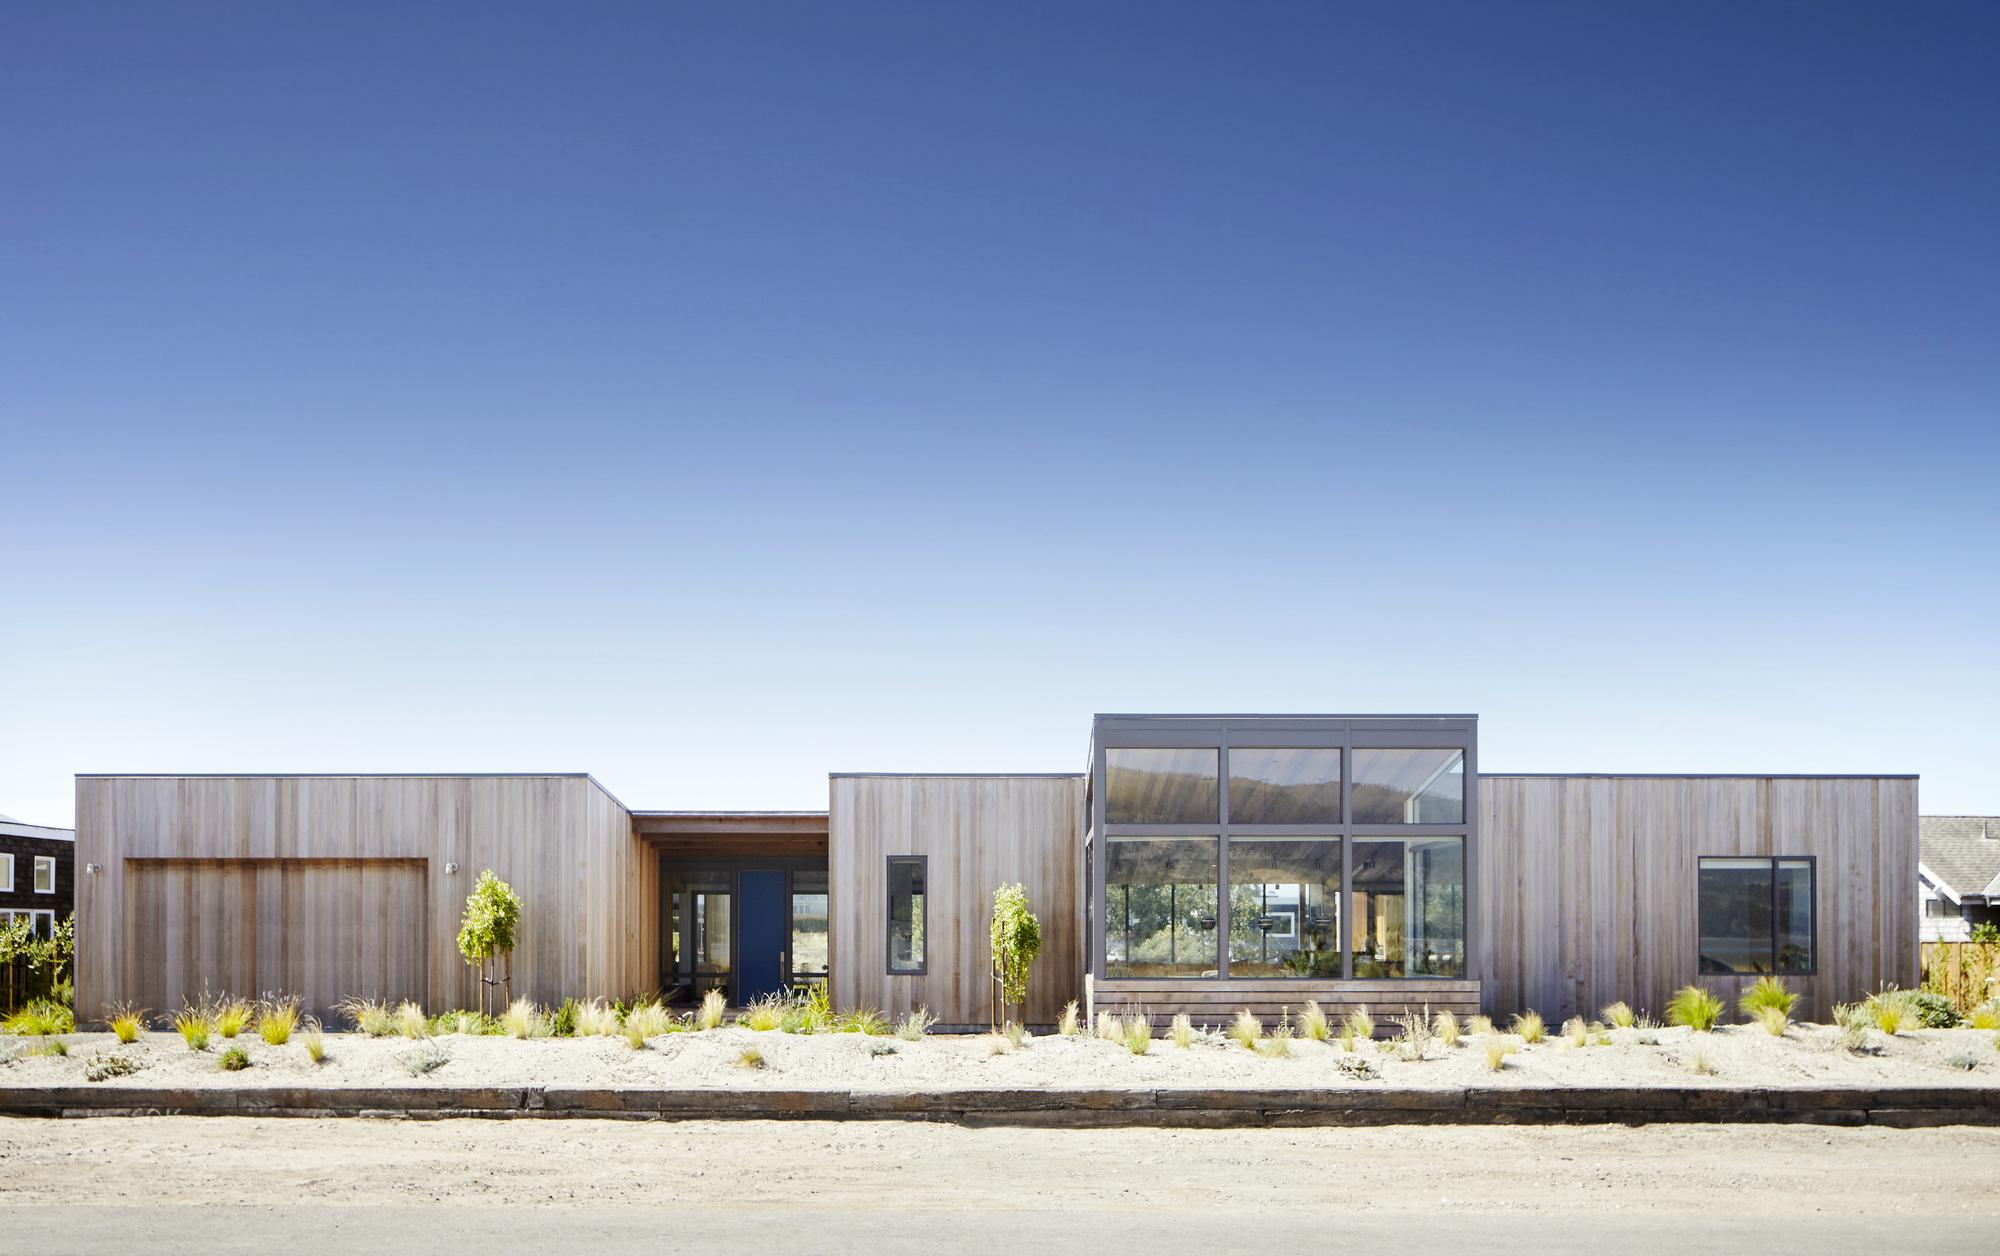 Blue apron niman ranch - Stinson Beach Lagoon Turnbull Griffin Haesloop Architects